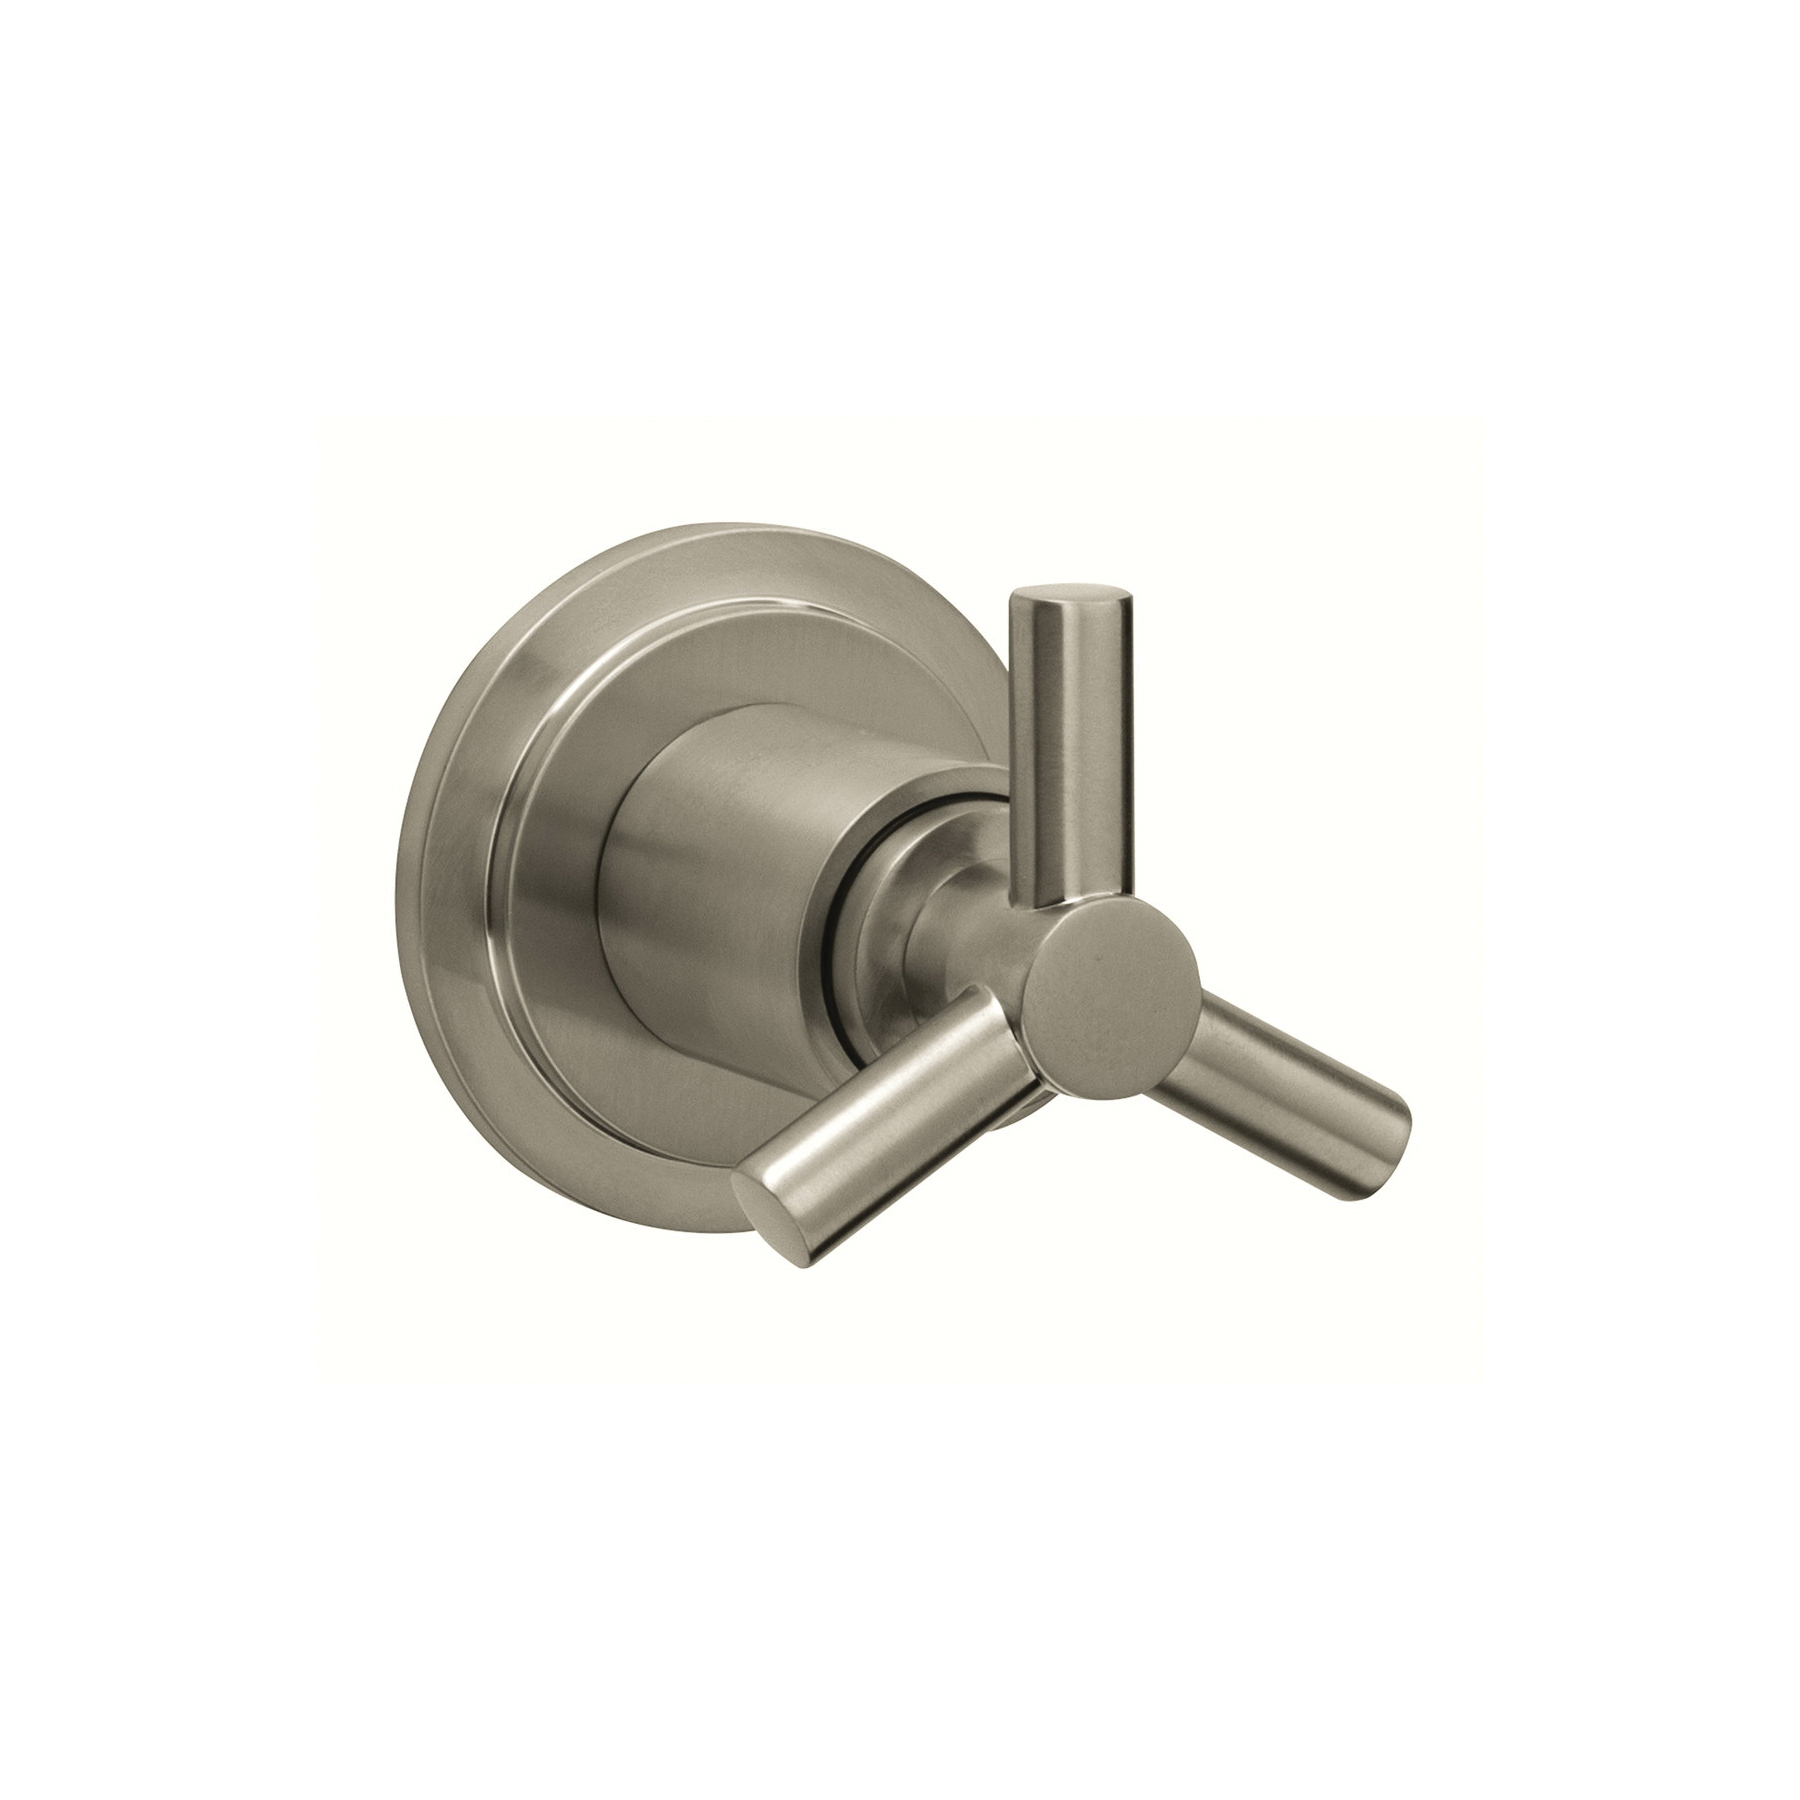 GROHE 19888EN0 Atrio® Volume Control Trim, StarLight® Brushed Nickel